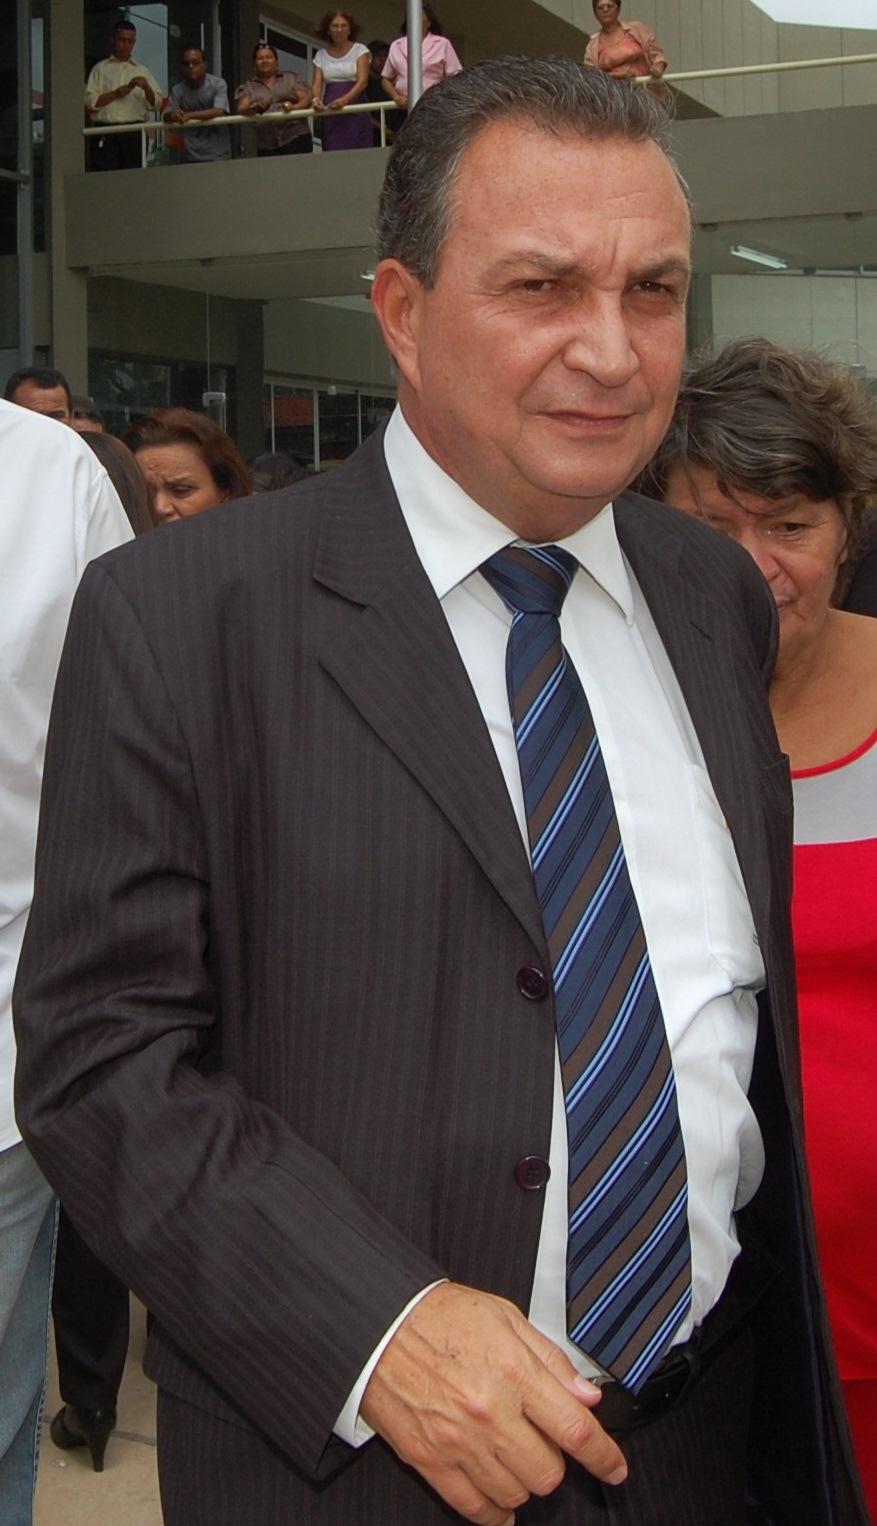 http://www.blogdojorgearagao.com.br/wp-content/uploads/2013/08/LUISFERNANDONOVA.jpg